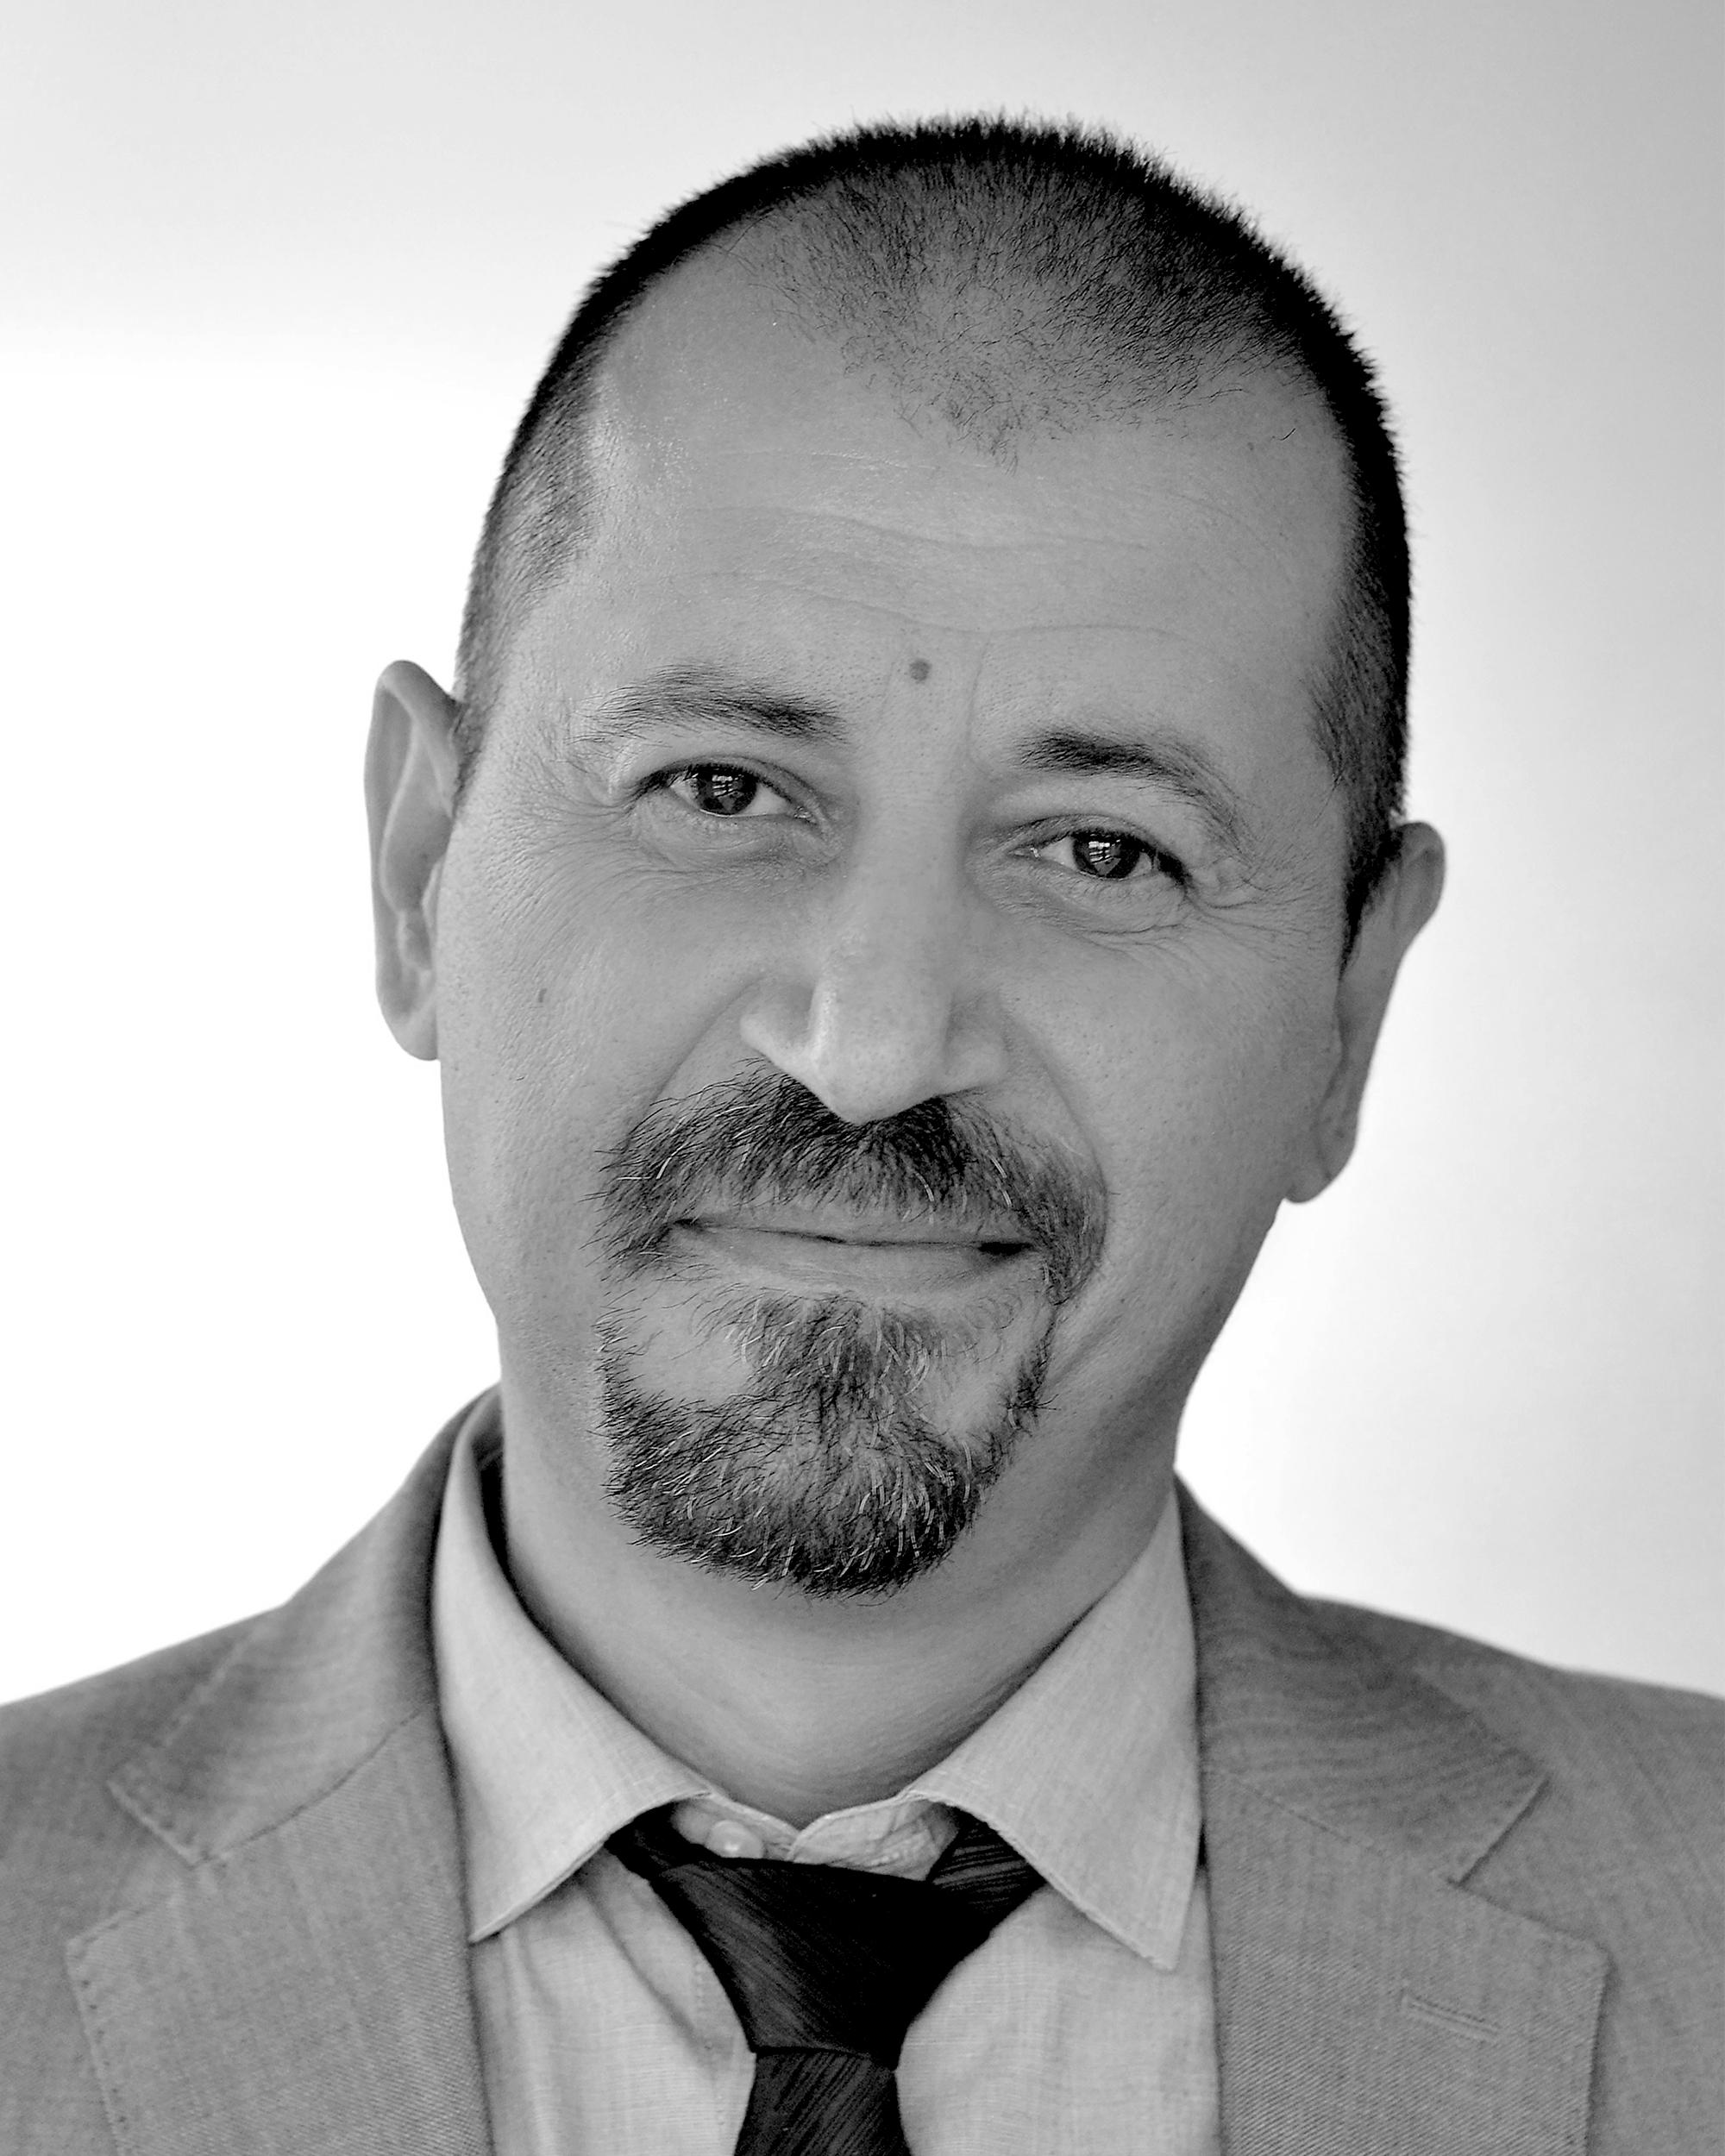 Headshot of Konstantinos (Kostas) Paslis